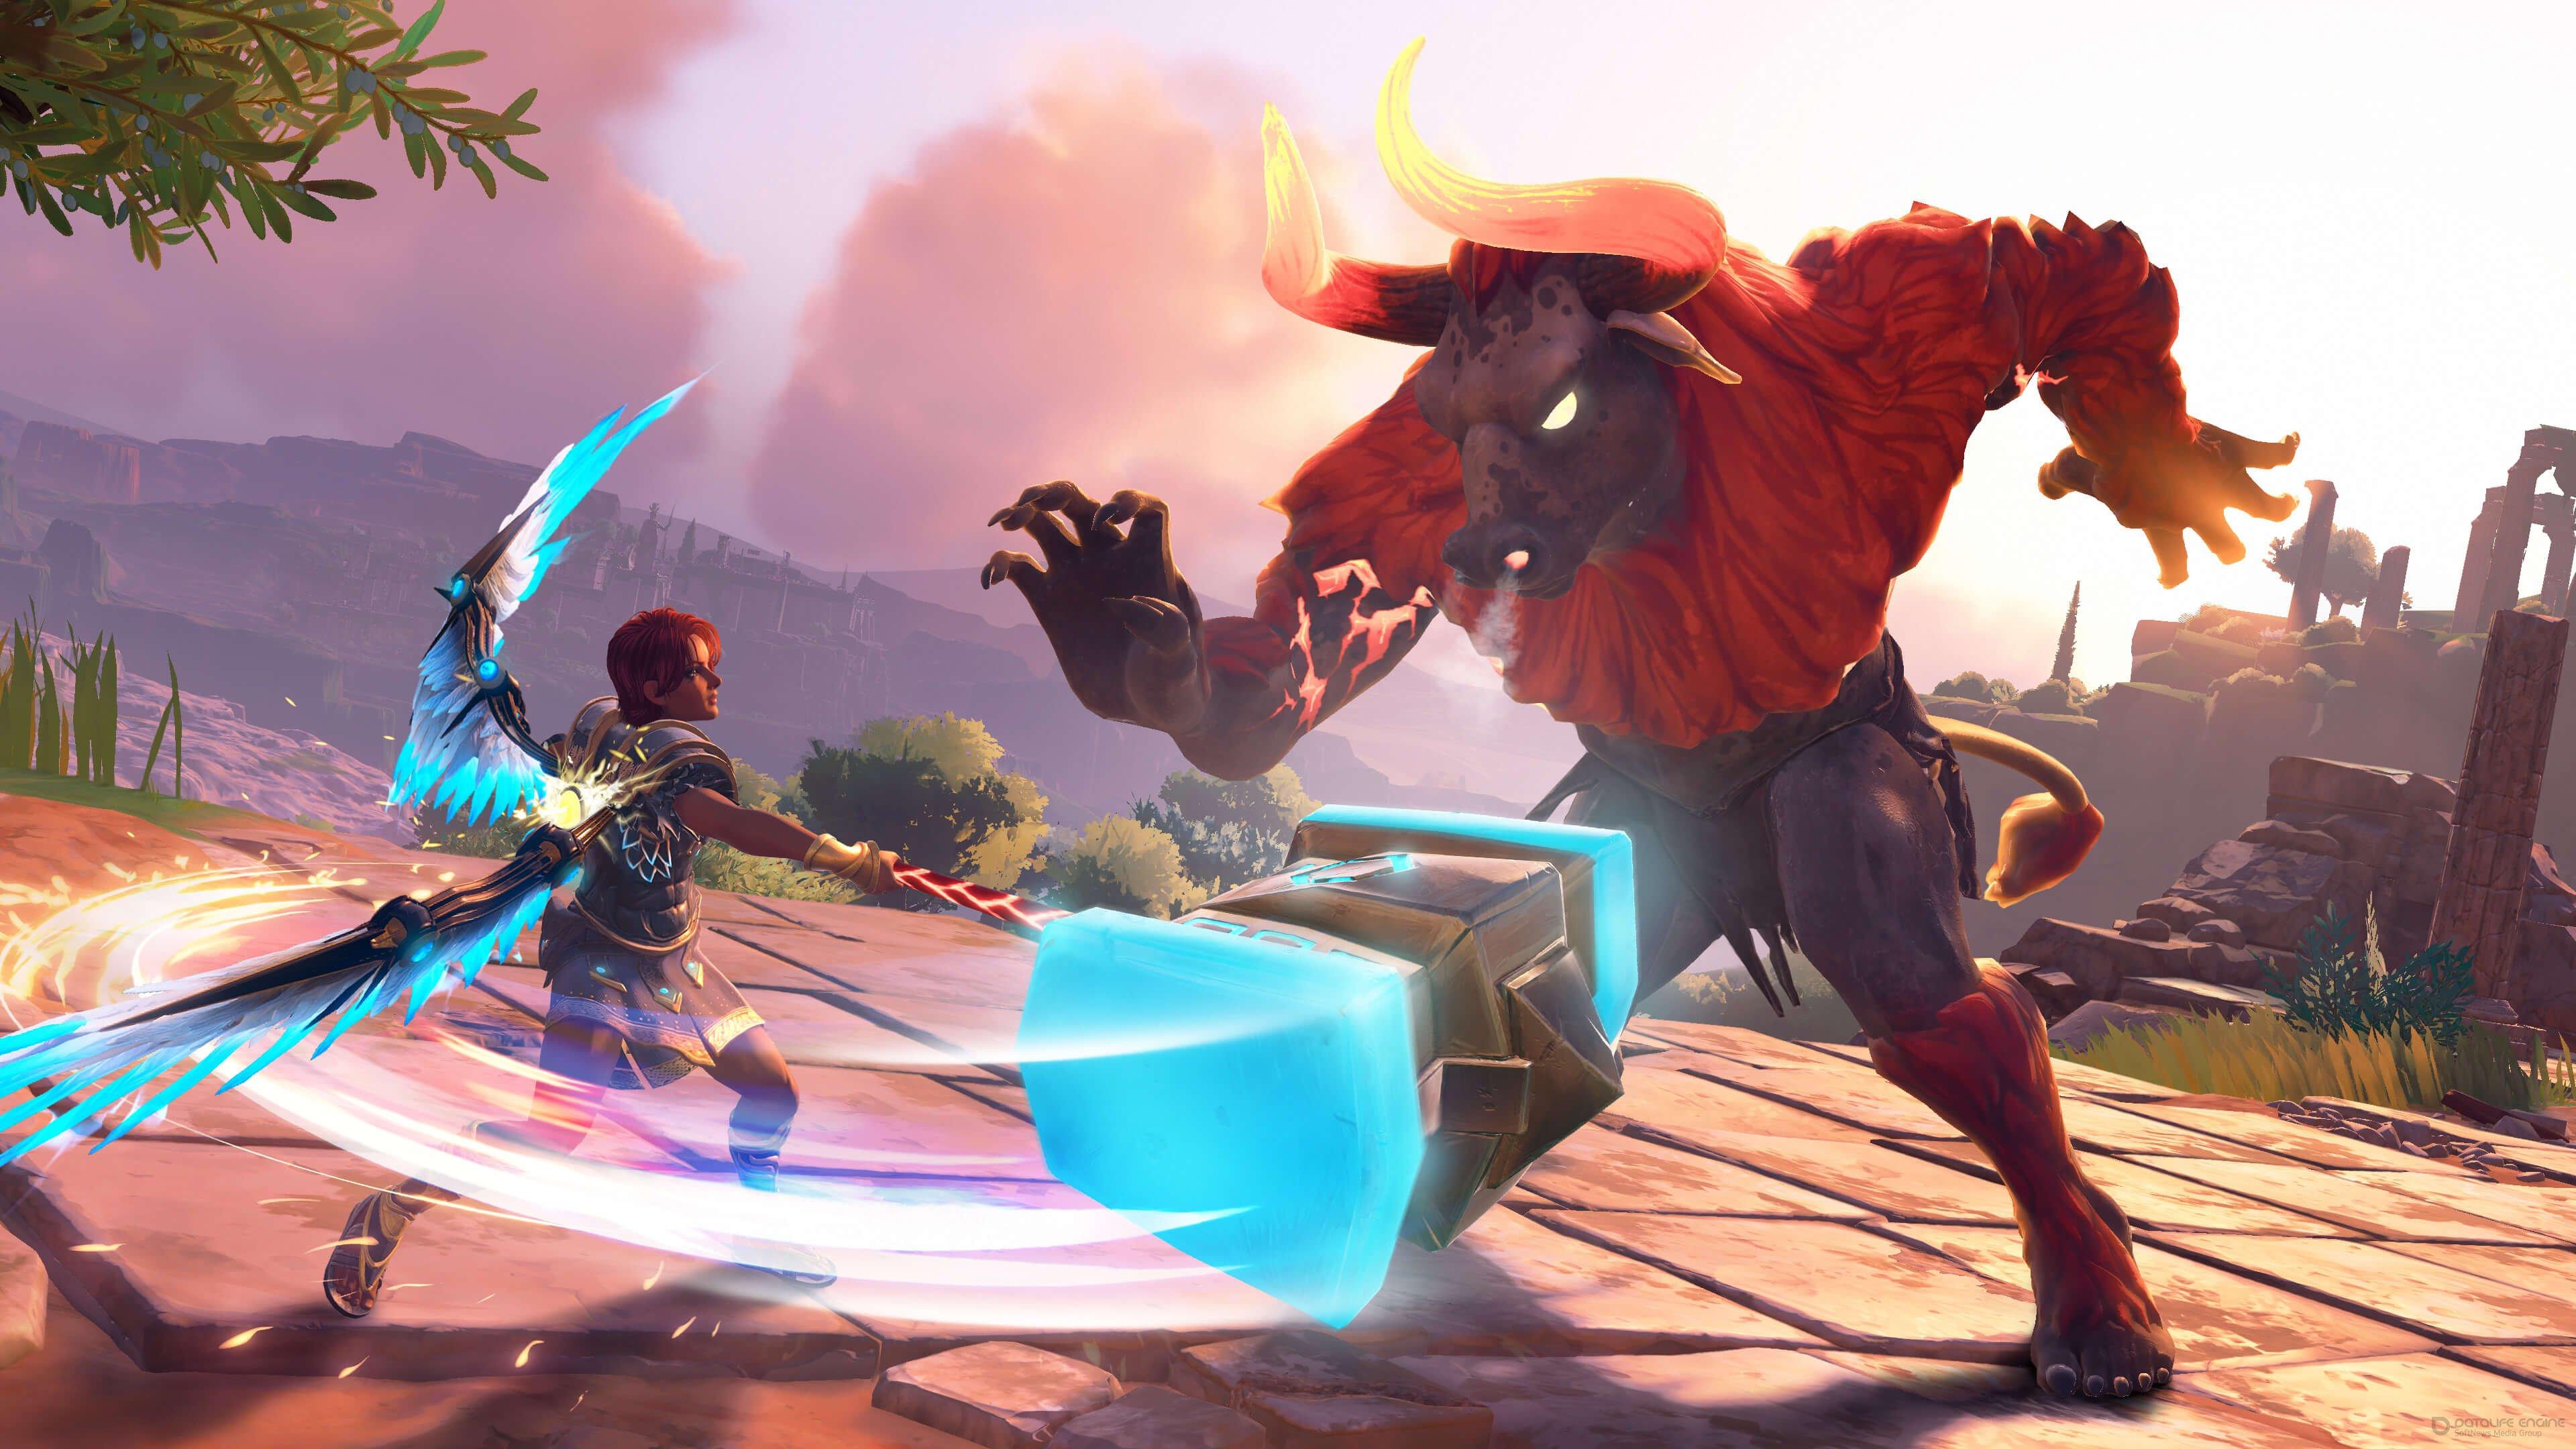 Скриншот к игре Immortals Fenyx Rising (2021) RePack от R.G. Механики